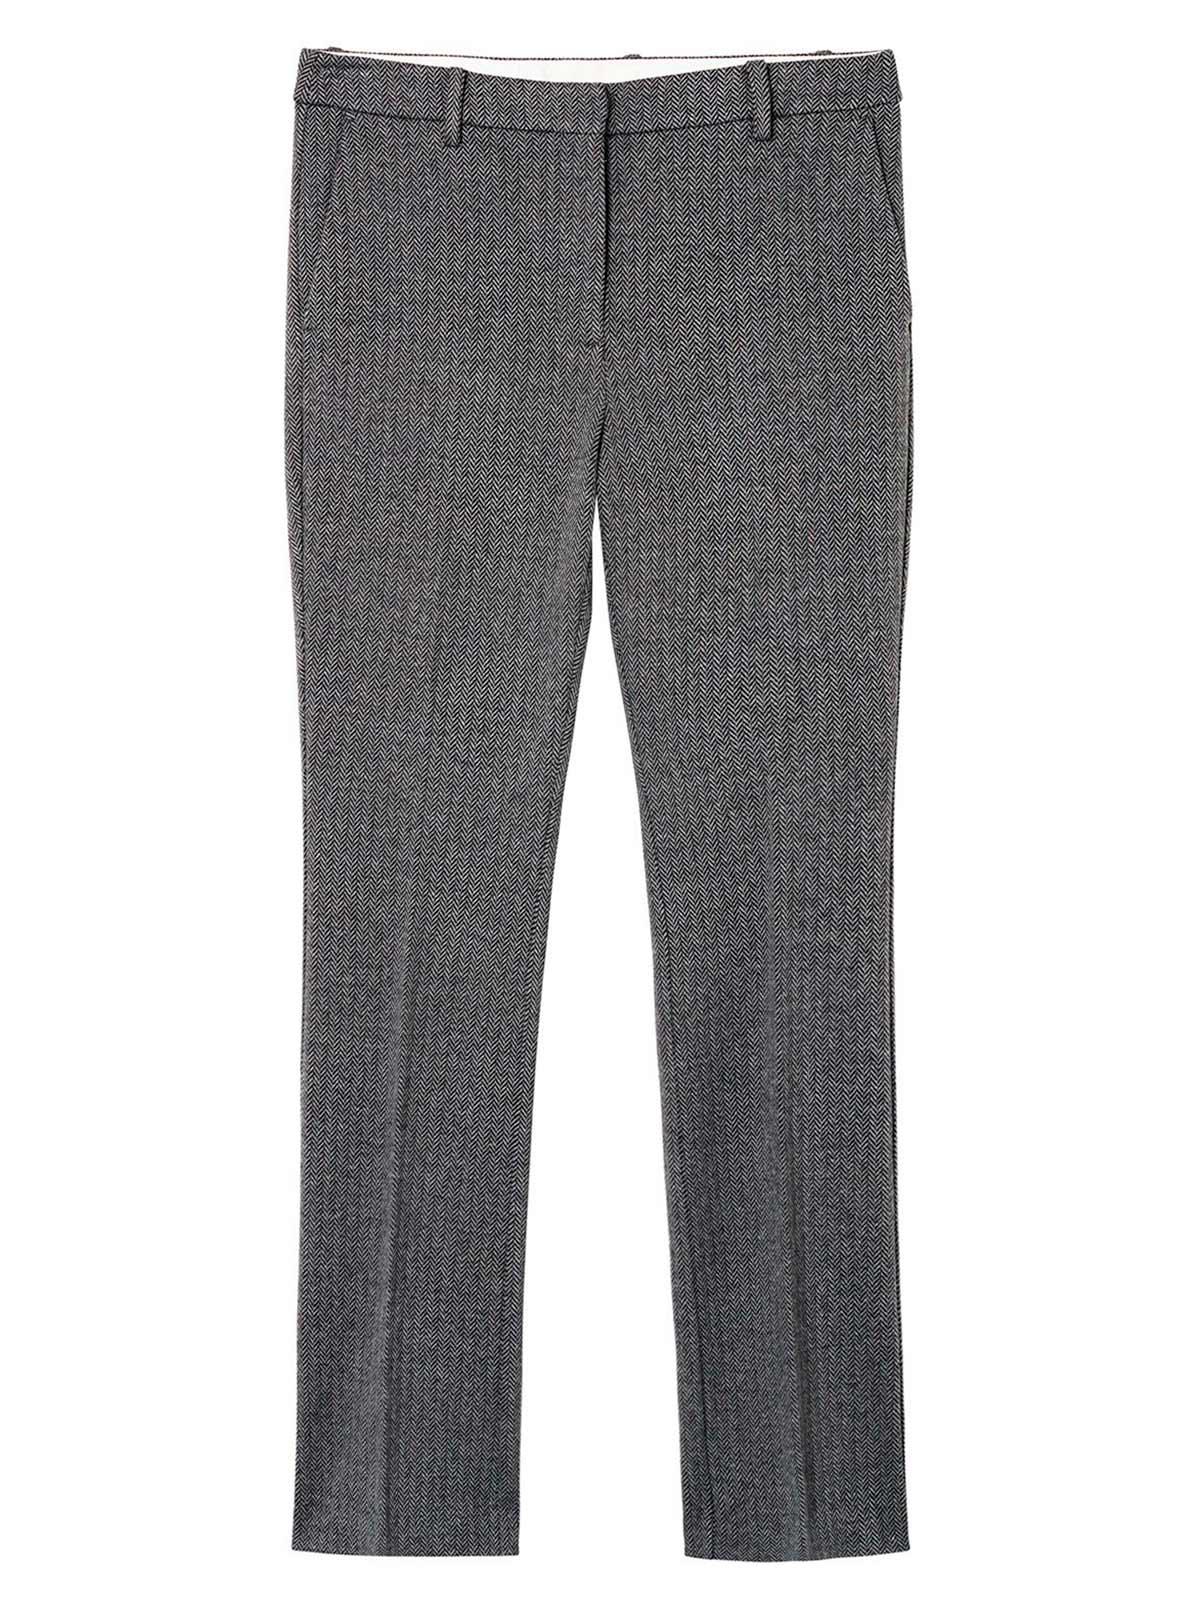 ae15032b4d gant-pantaloni-jersey-donna-92 | 1803.4150045 | Botta & B Online Store